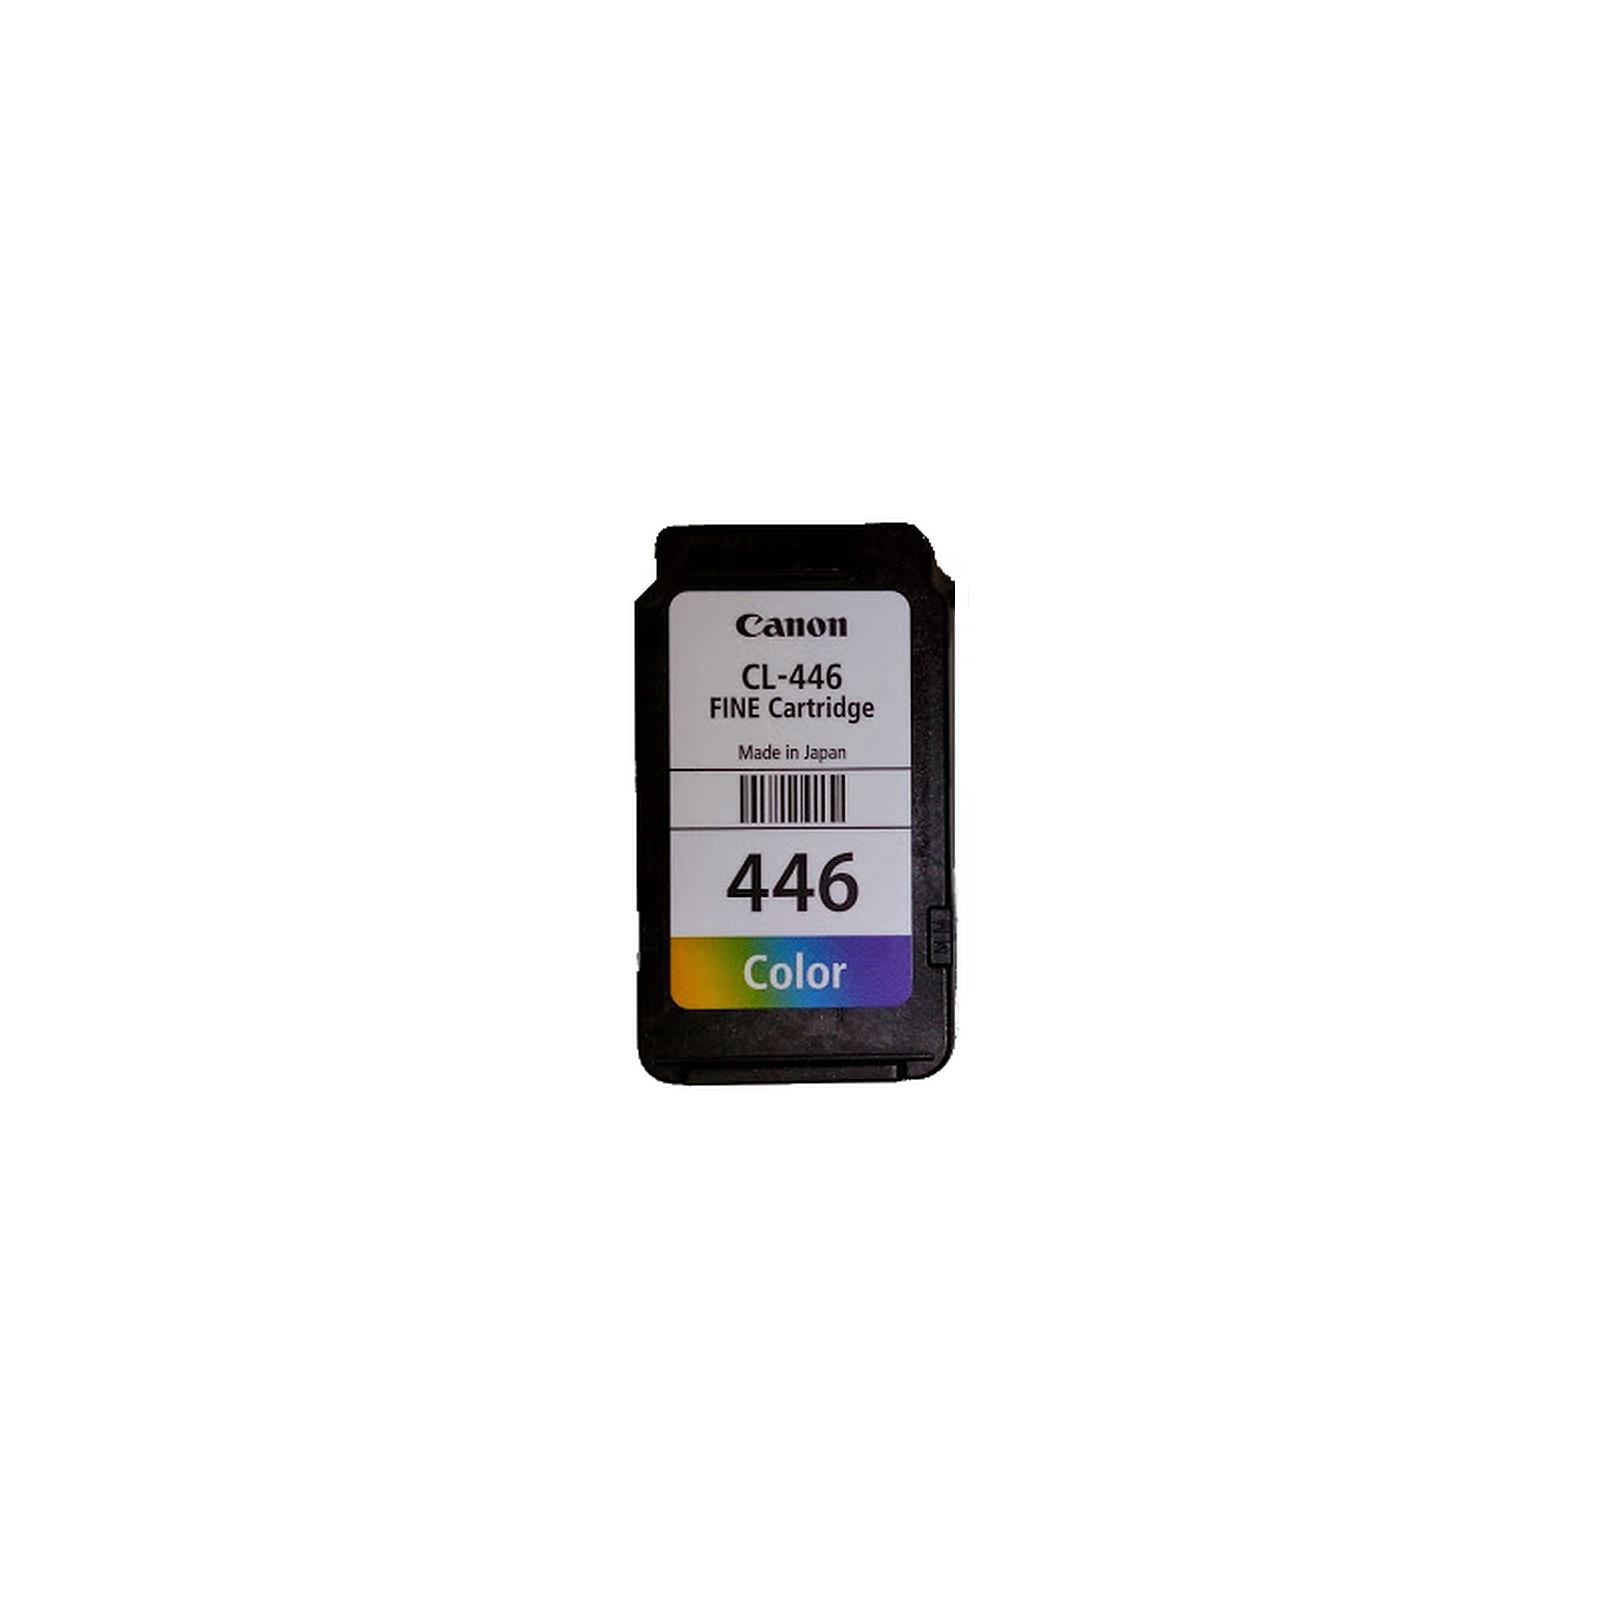 Картридж Canon PG-445 MULTI (Black+Color) (8283B004) изображение 3